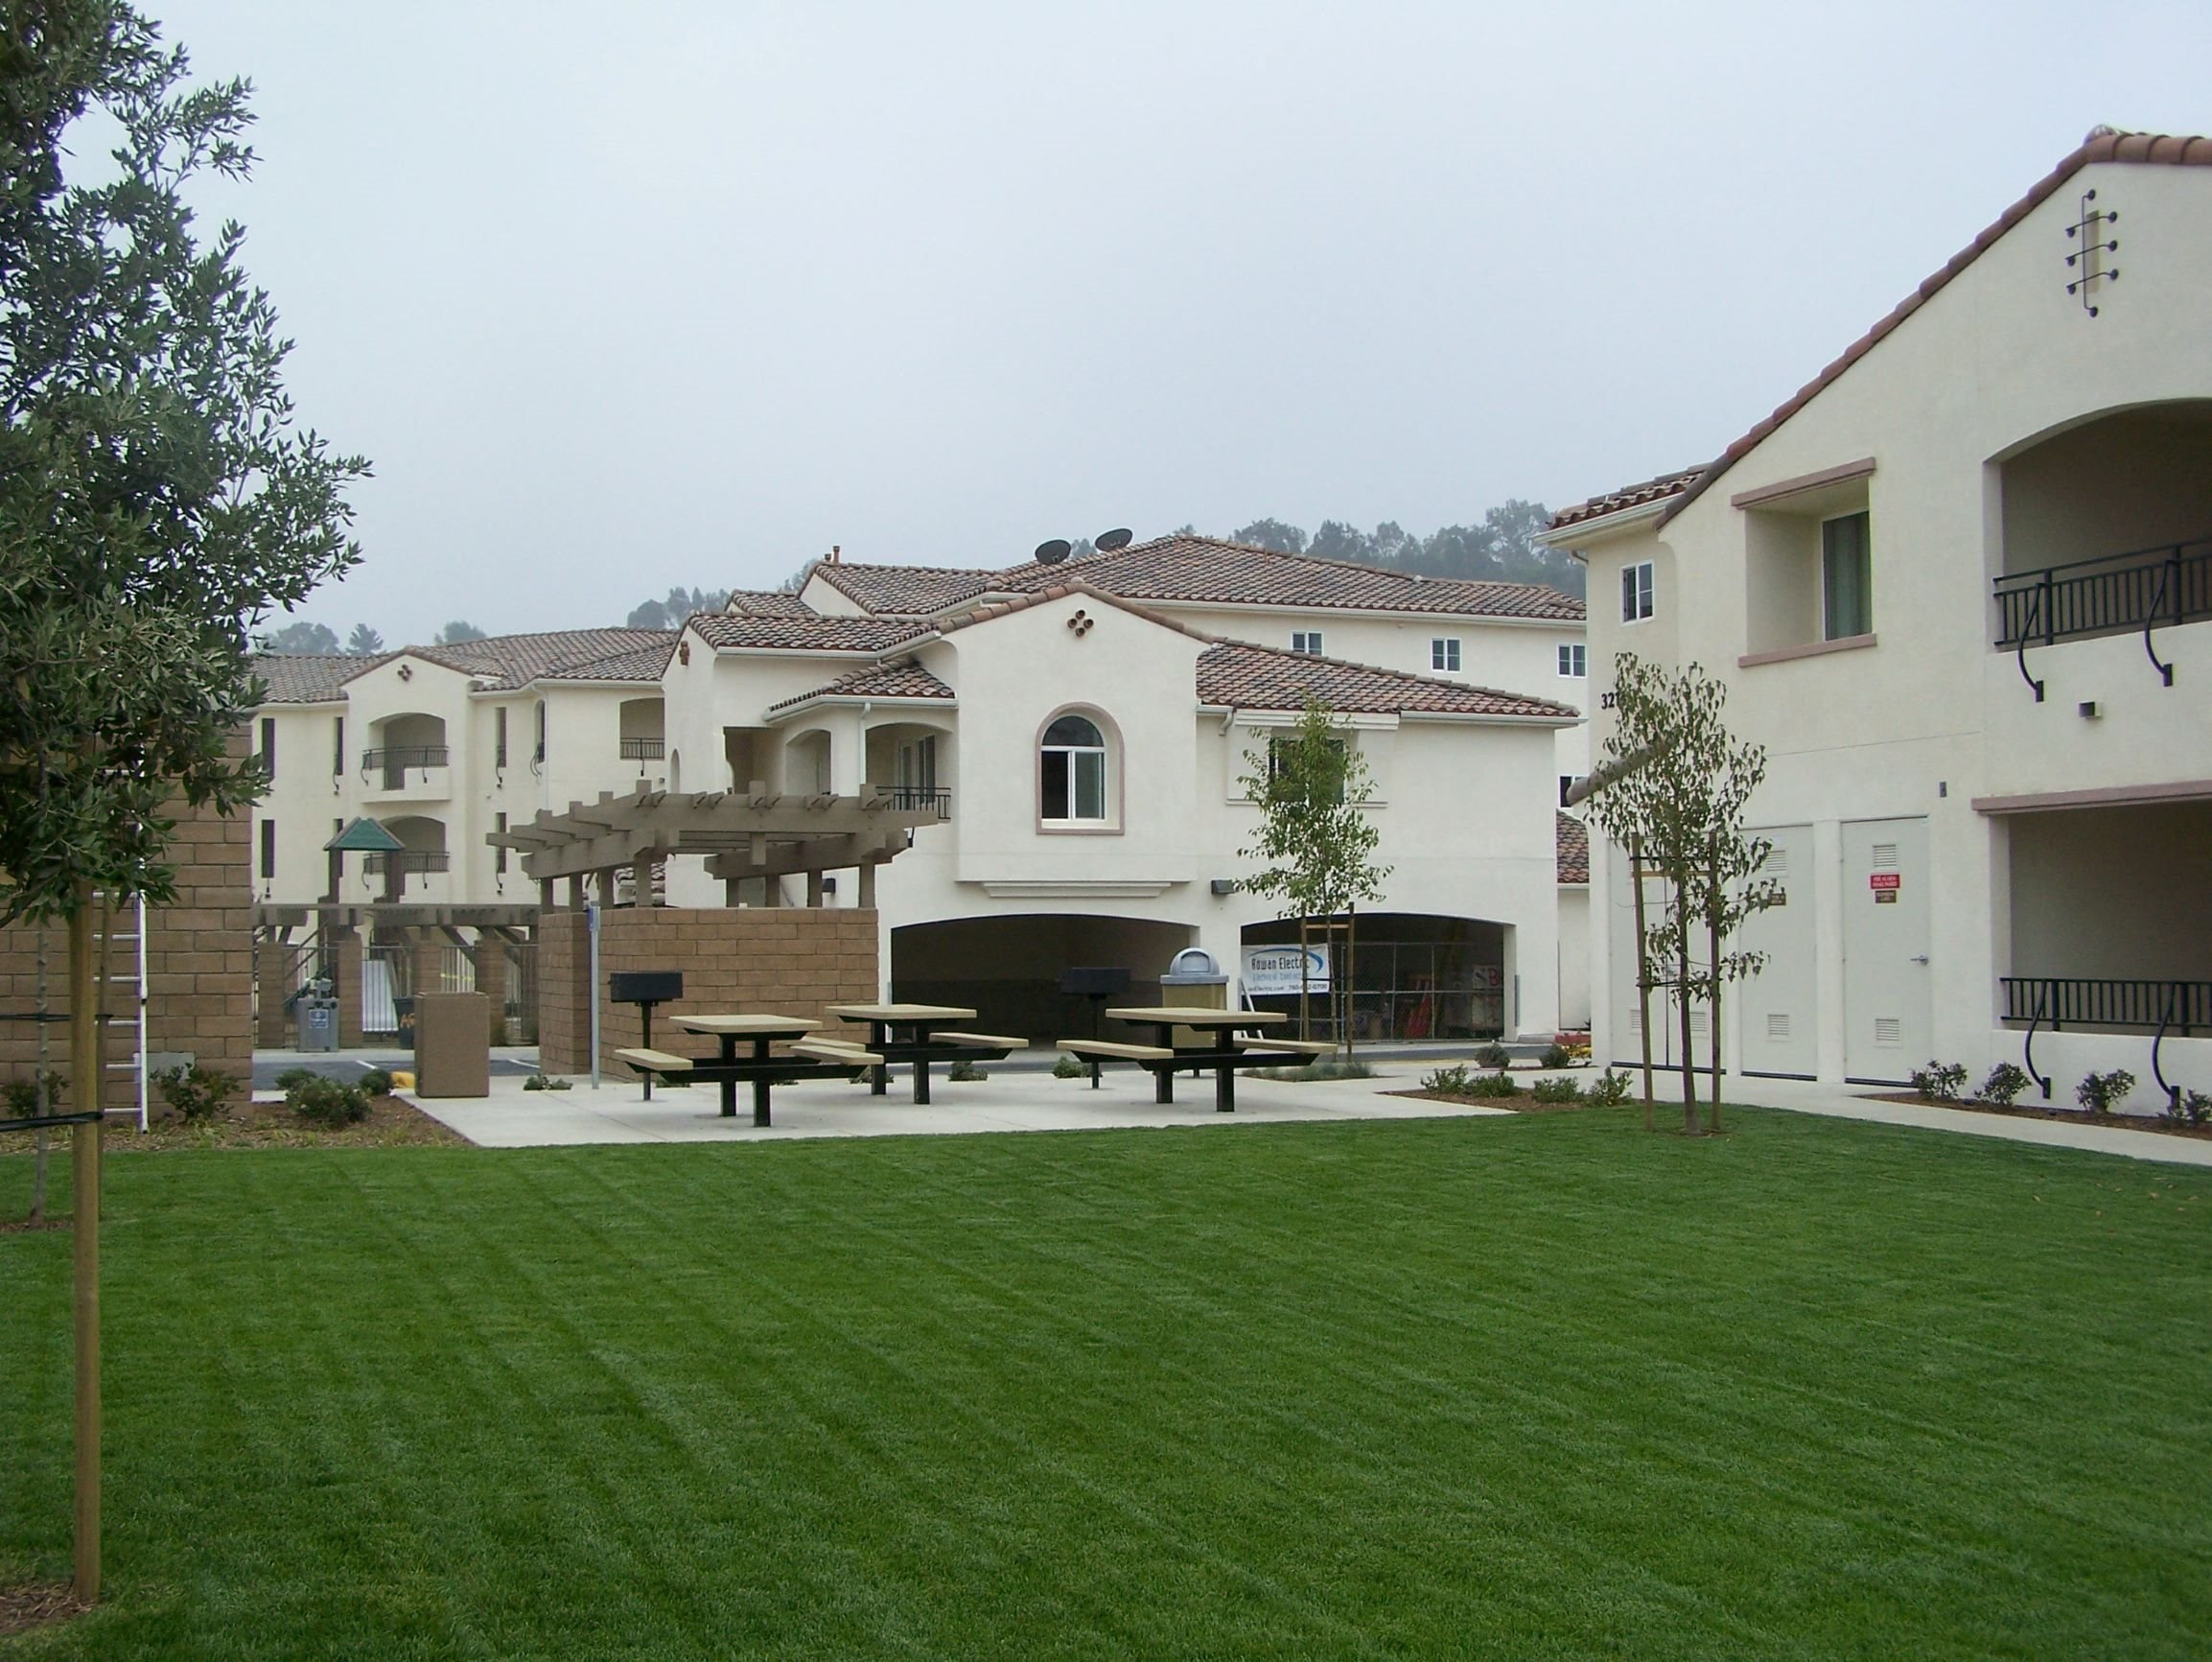 La Mision Village Courtyard